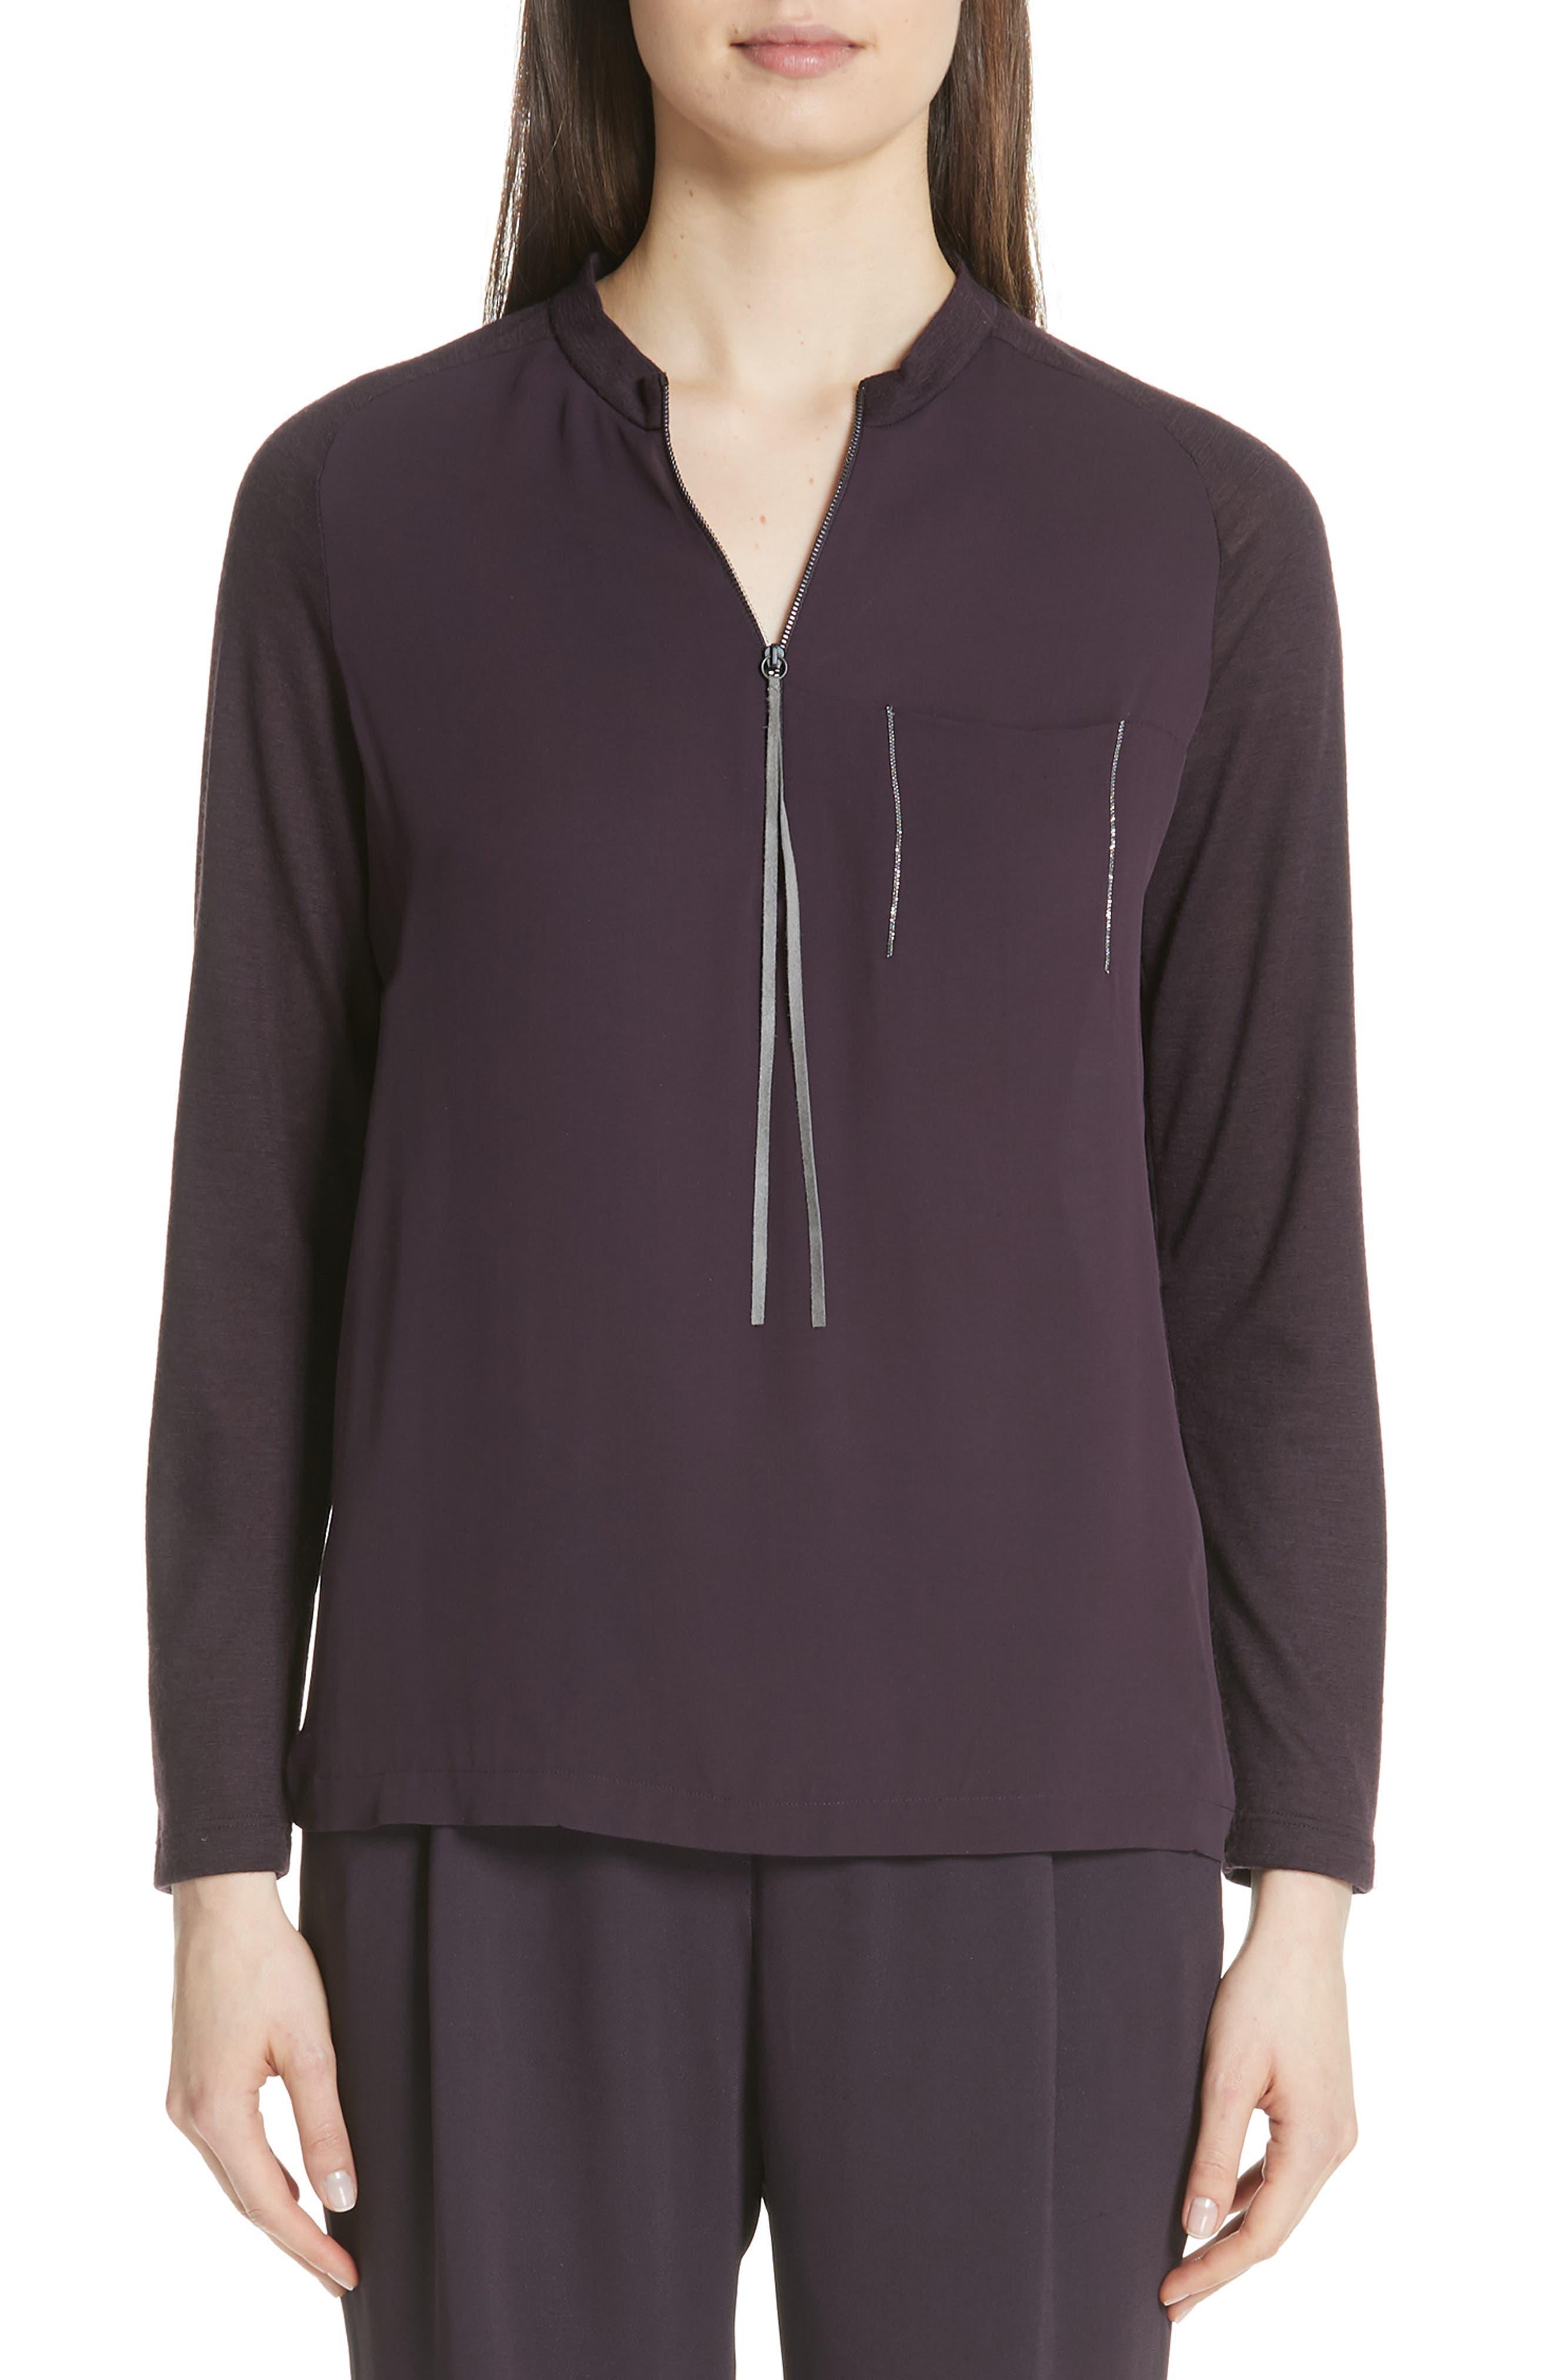 Fabiana Filippi Satin Front Merino Wool Sweater, 8 IT - Purple